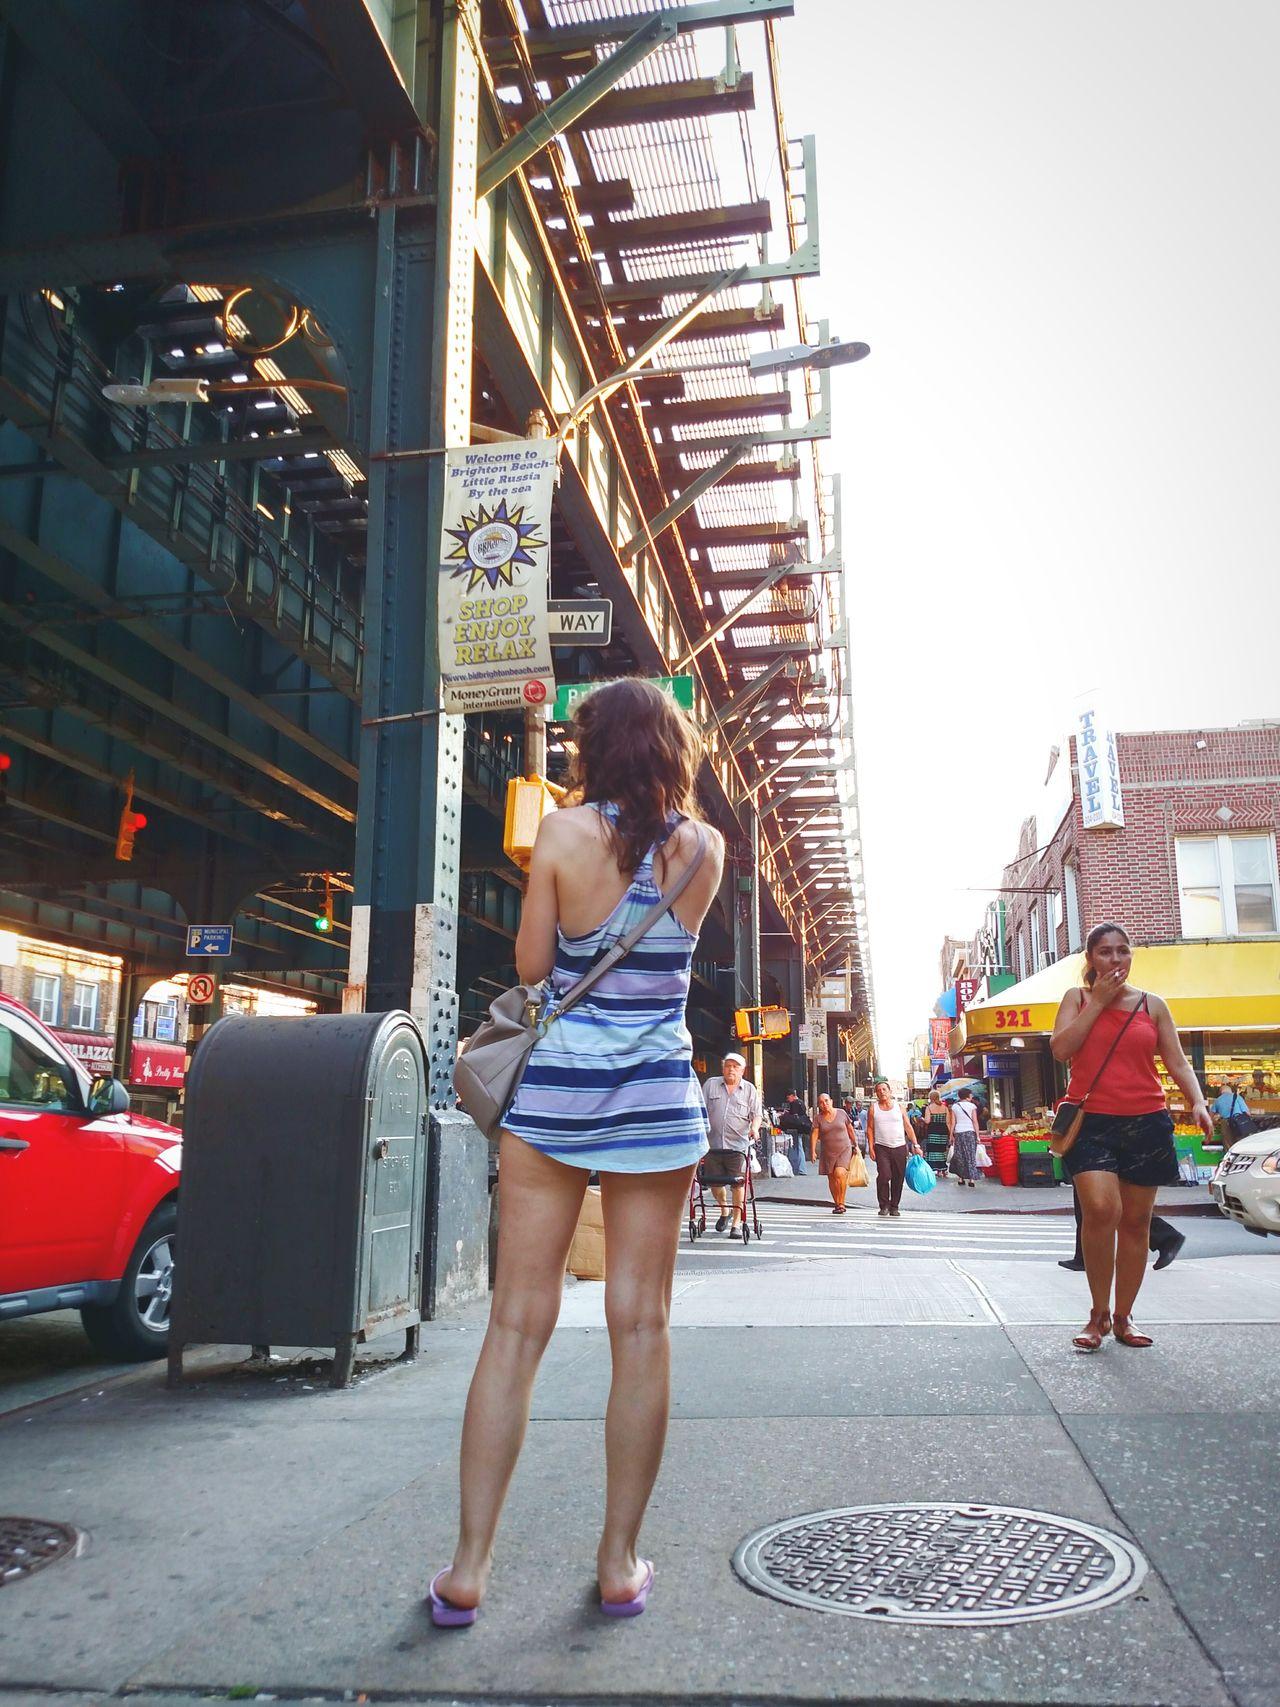 Urban Lifestyle Street Photography NYC Girl Sexylegs Perspective People Sexygirl Eye4photography  City